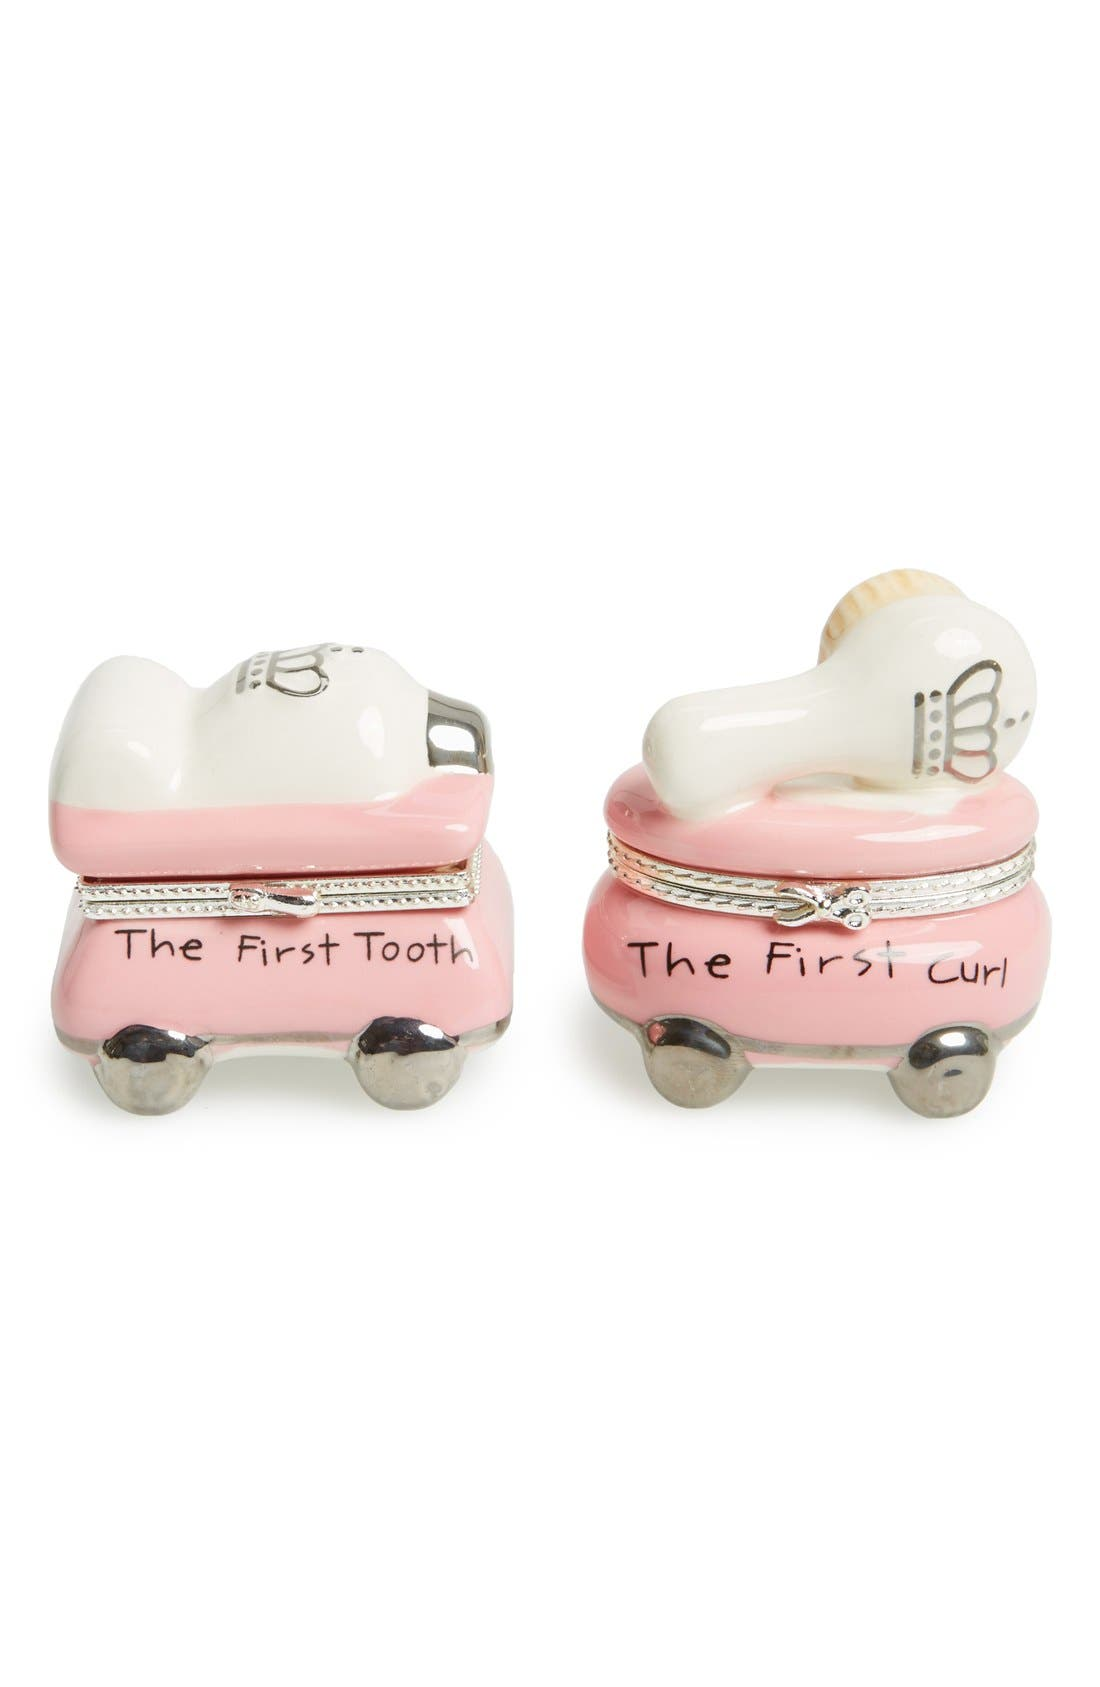 Alternate Image 1 Selected - Mud Pie 'Princess' First Tooth & Curl Treasure Box Set